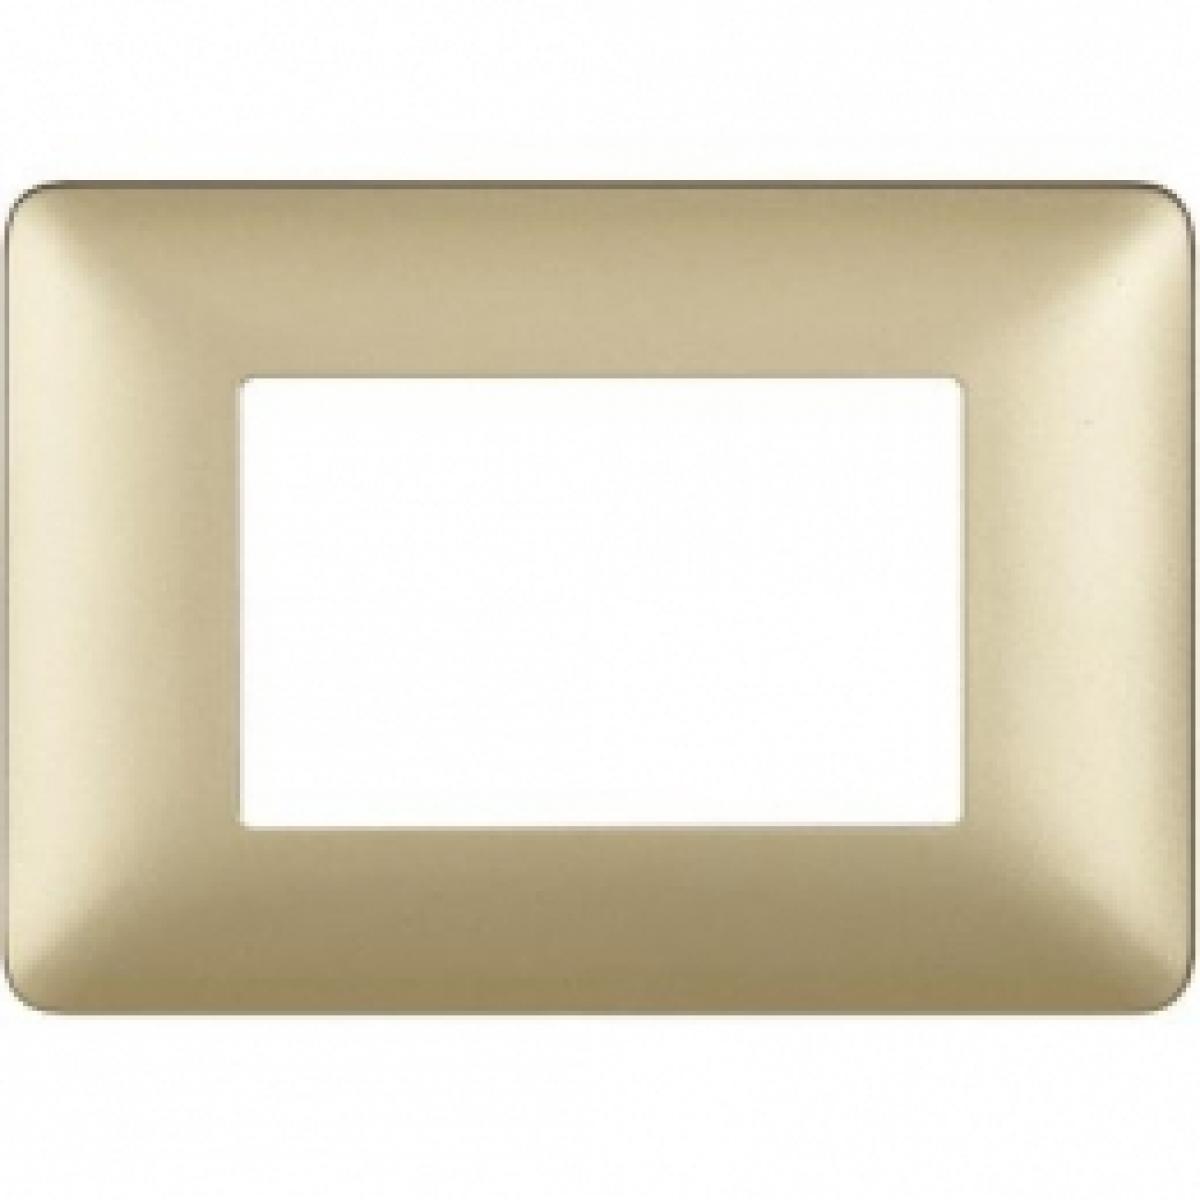 Placca 3 Moduli Gold Bticino Matix AM4803MGL